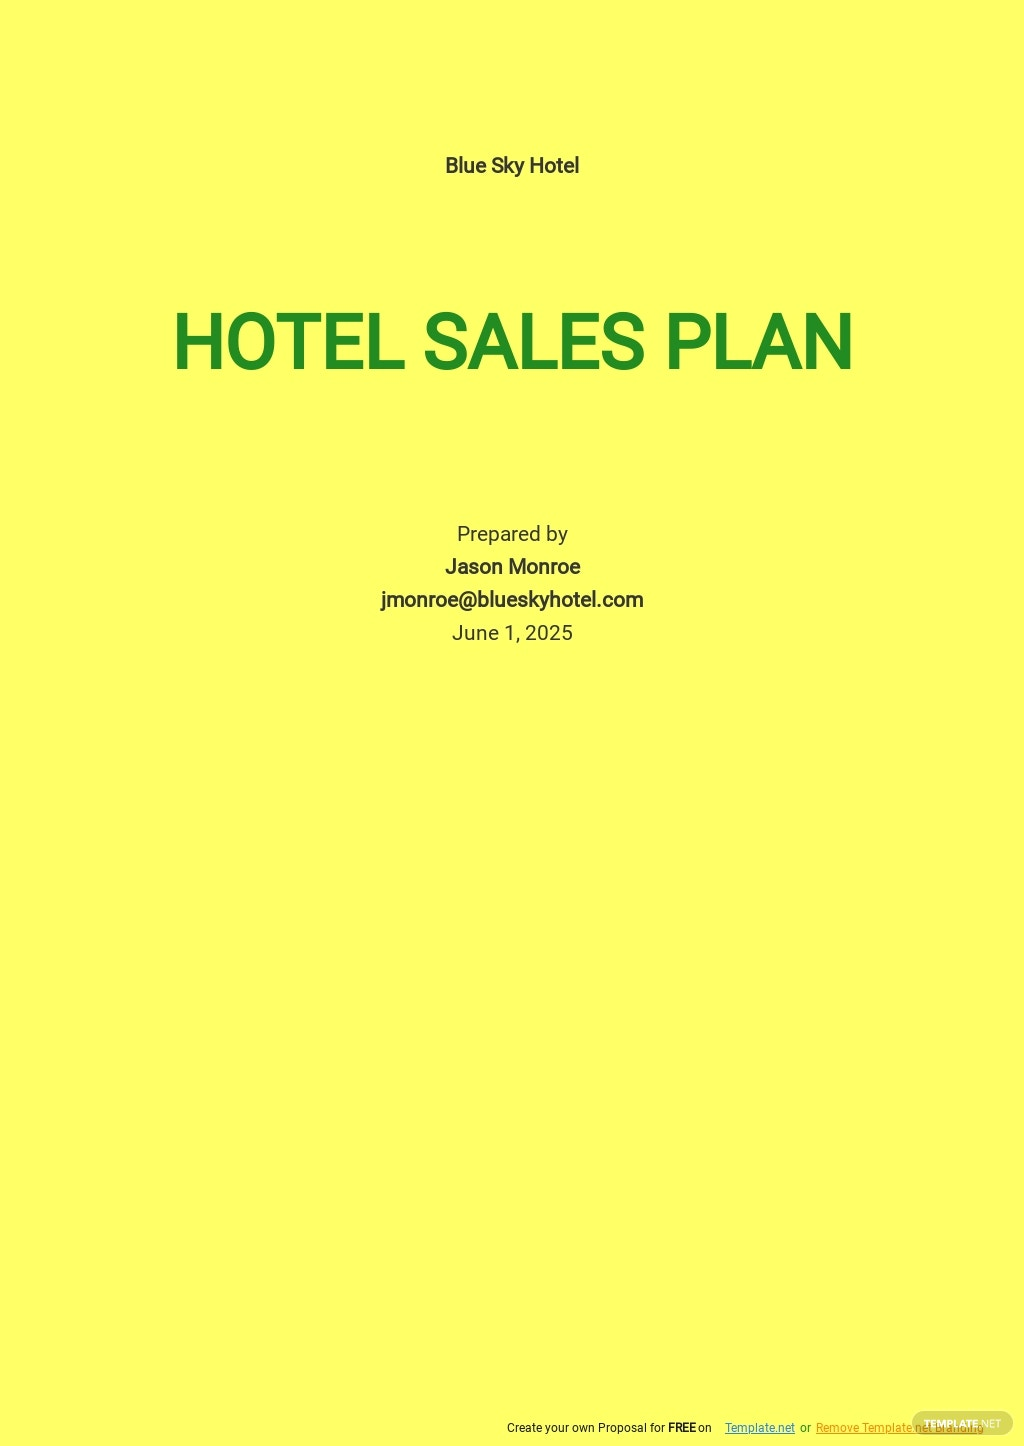 Sample Hotel Sales Plan Template.jpe